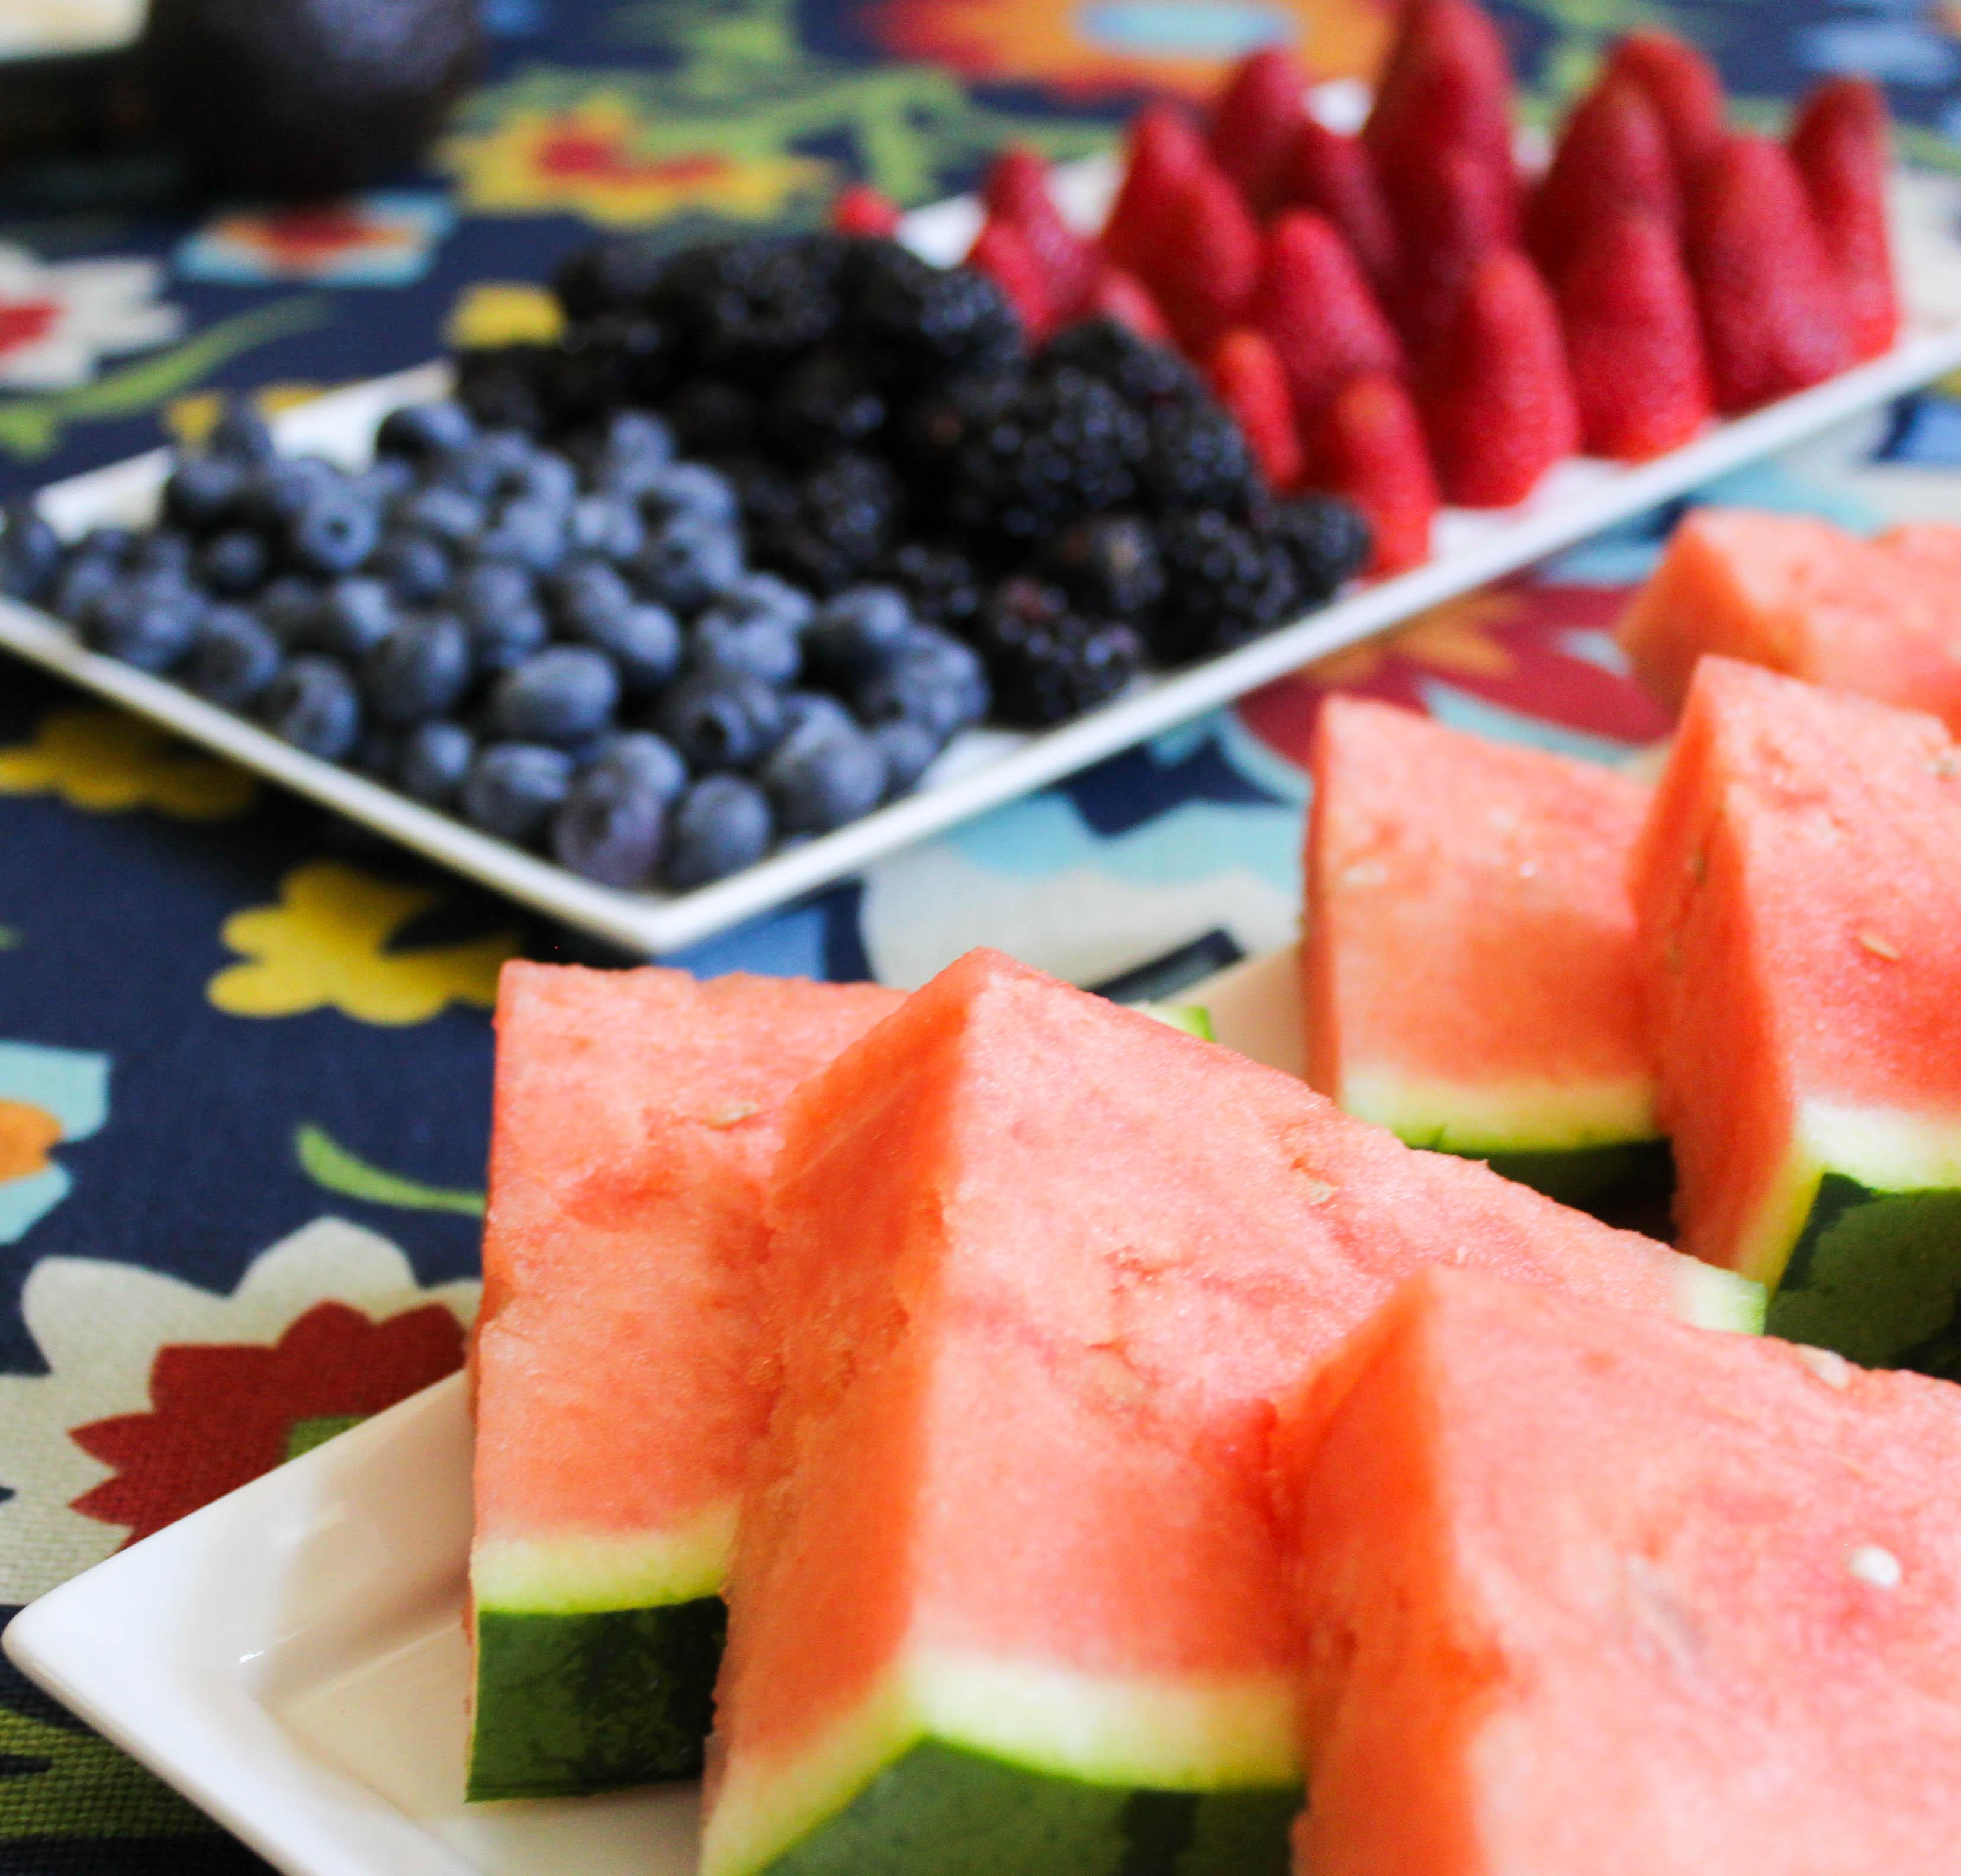 fruit platter berries watermelon slices menu summer